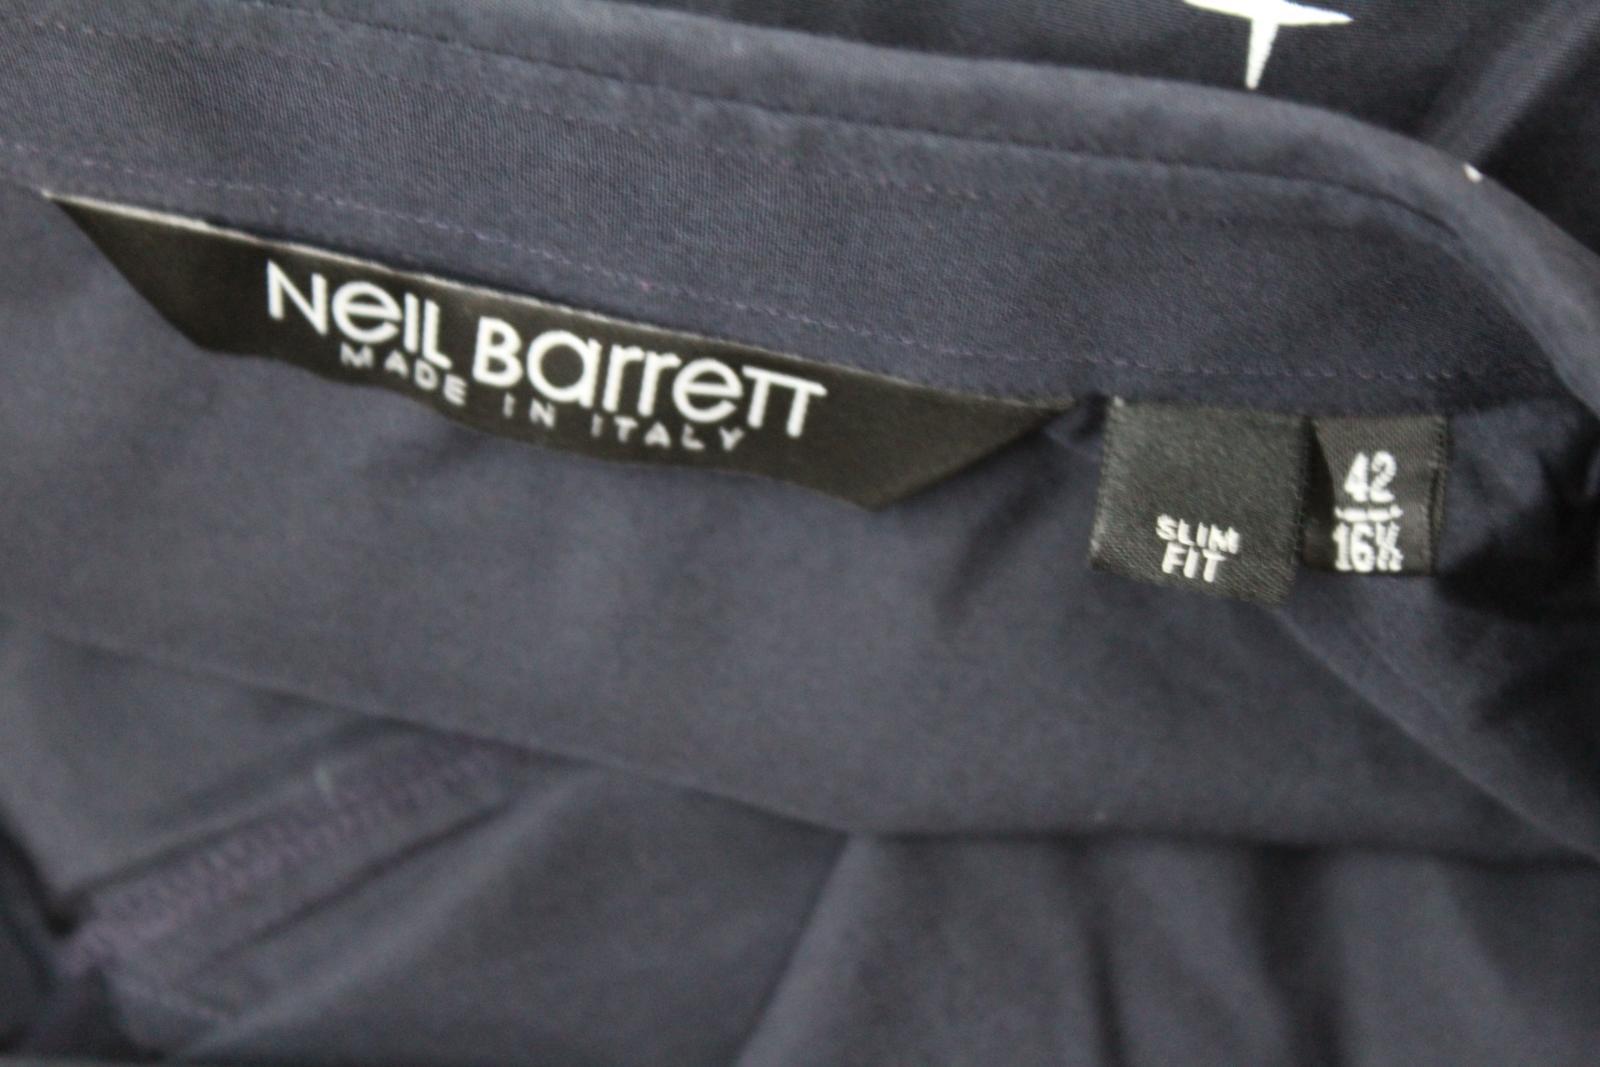 Neil-Barrett-Hombre-Azul-Marino-Blanco-Cuello-De-Camisa-formal-calce-Cruz-16-5-034-42cm miniatura 8